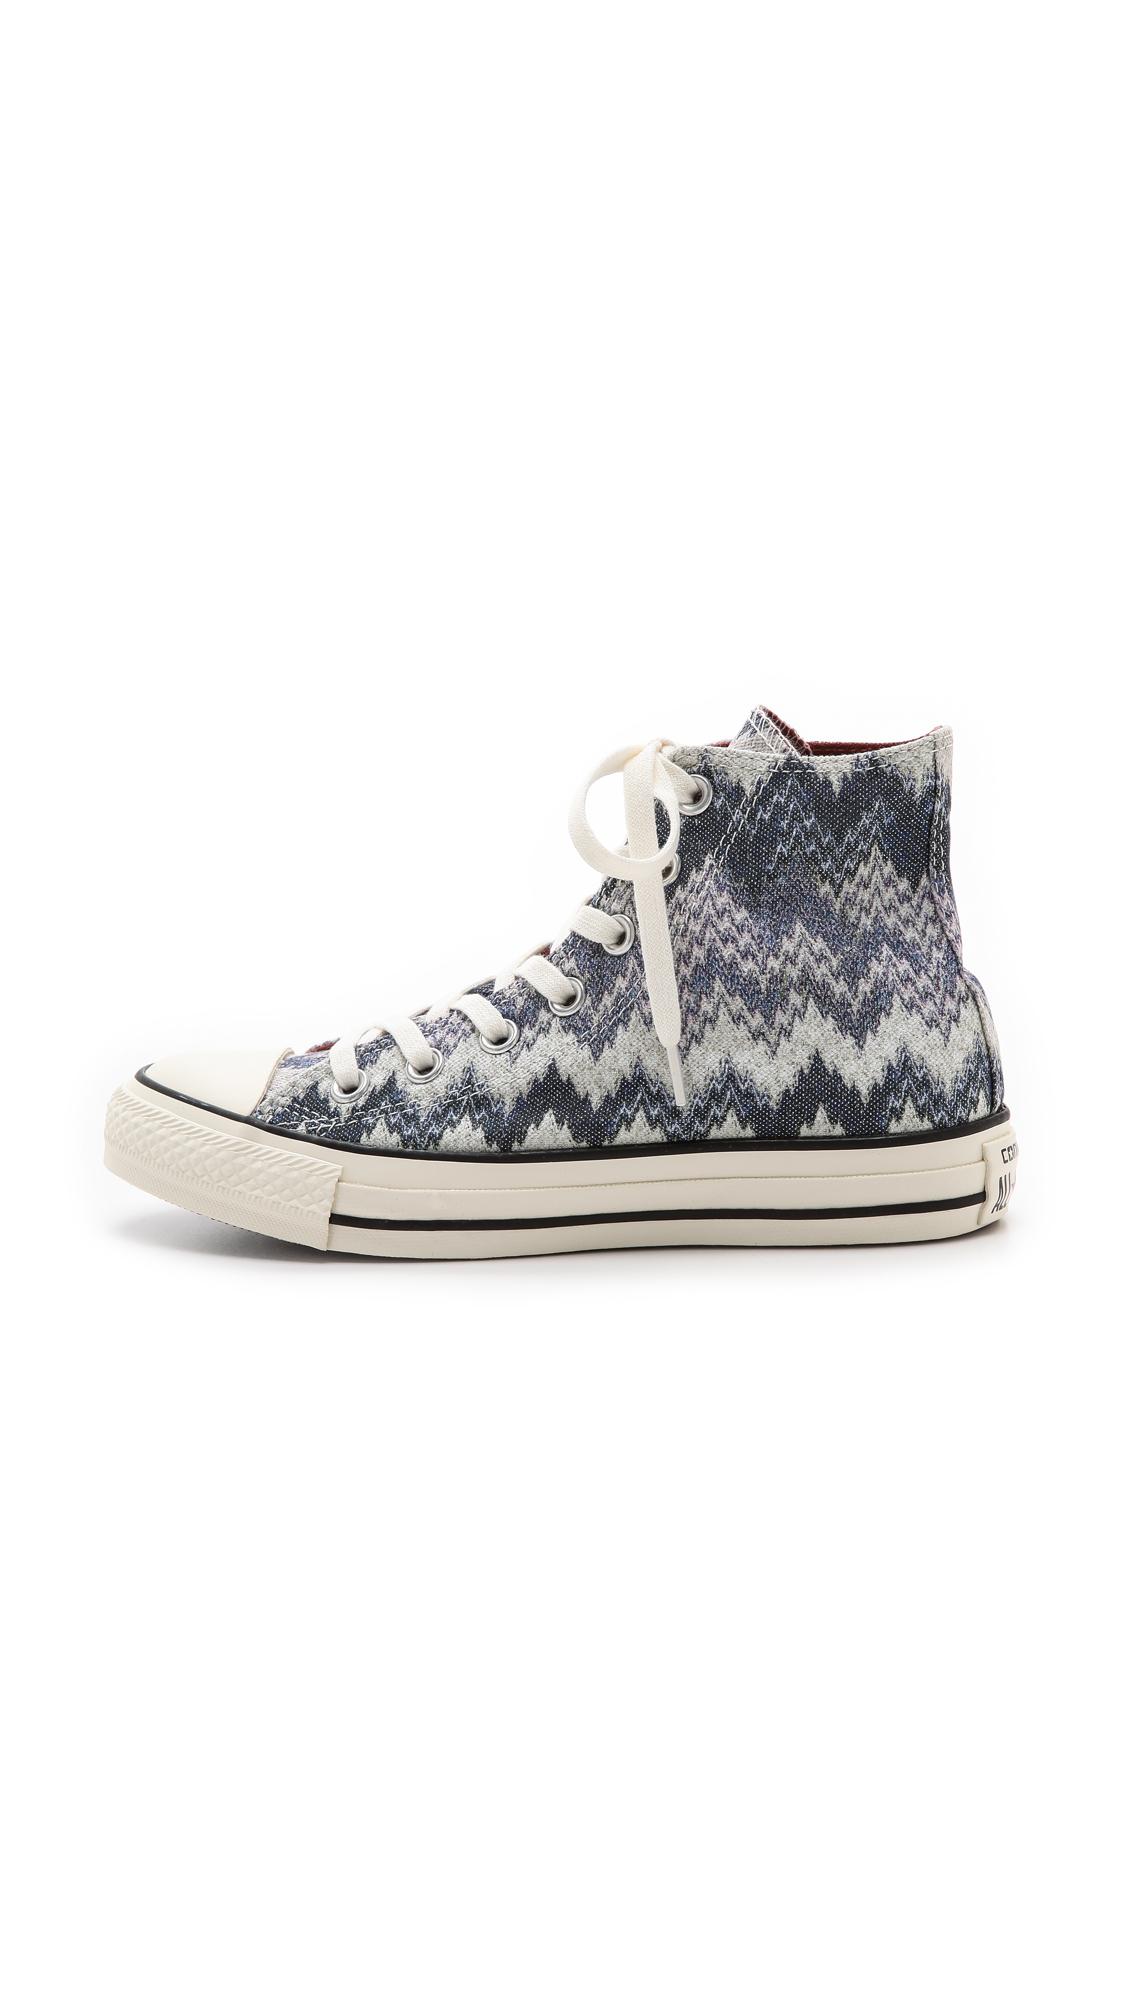 73bd839db9f1d Converse Chuck Taylor All Star Missoni High Top Sneakers - Egret ...